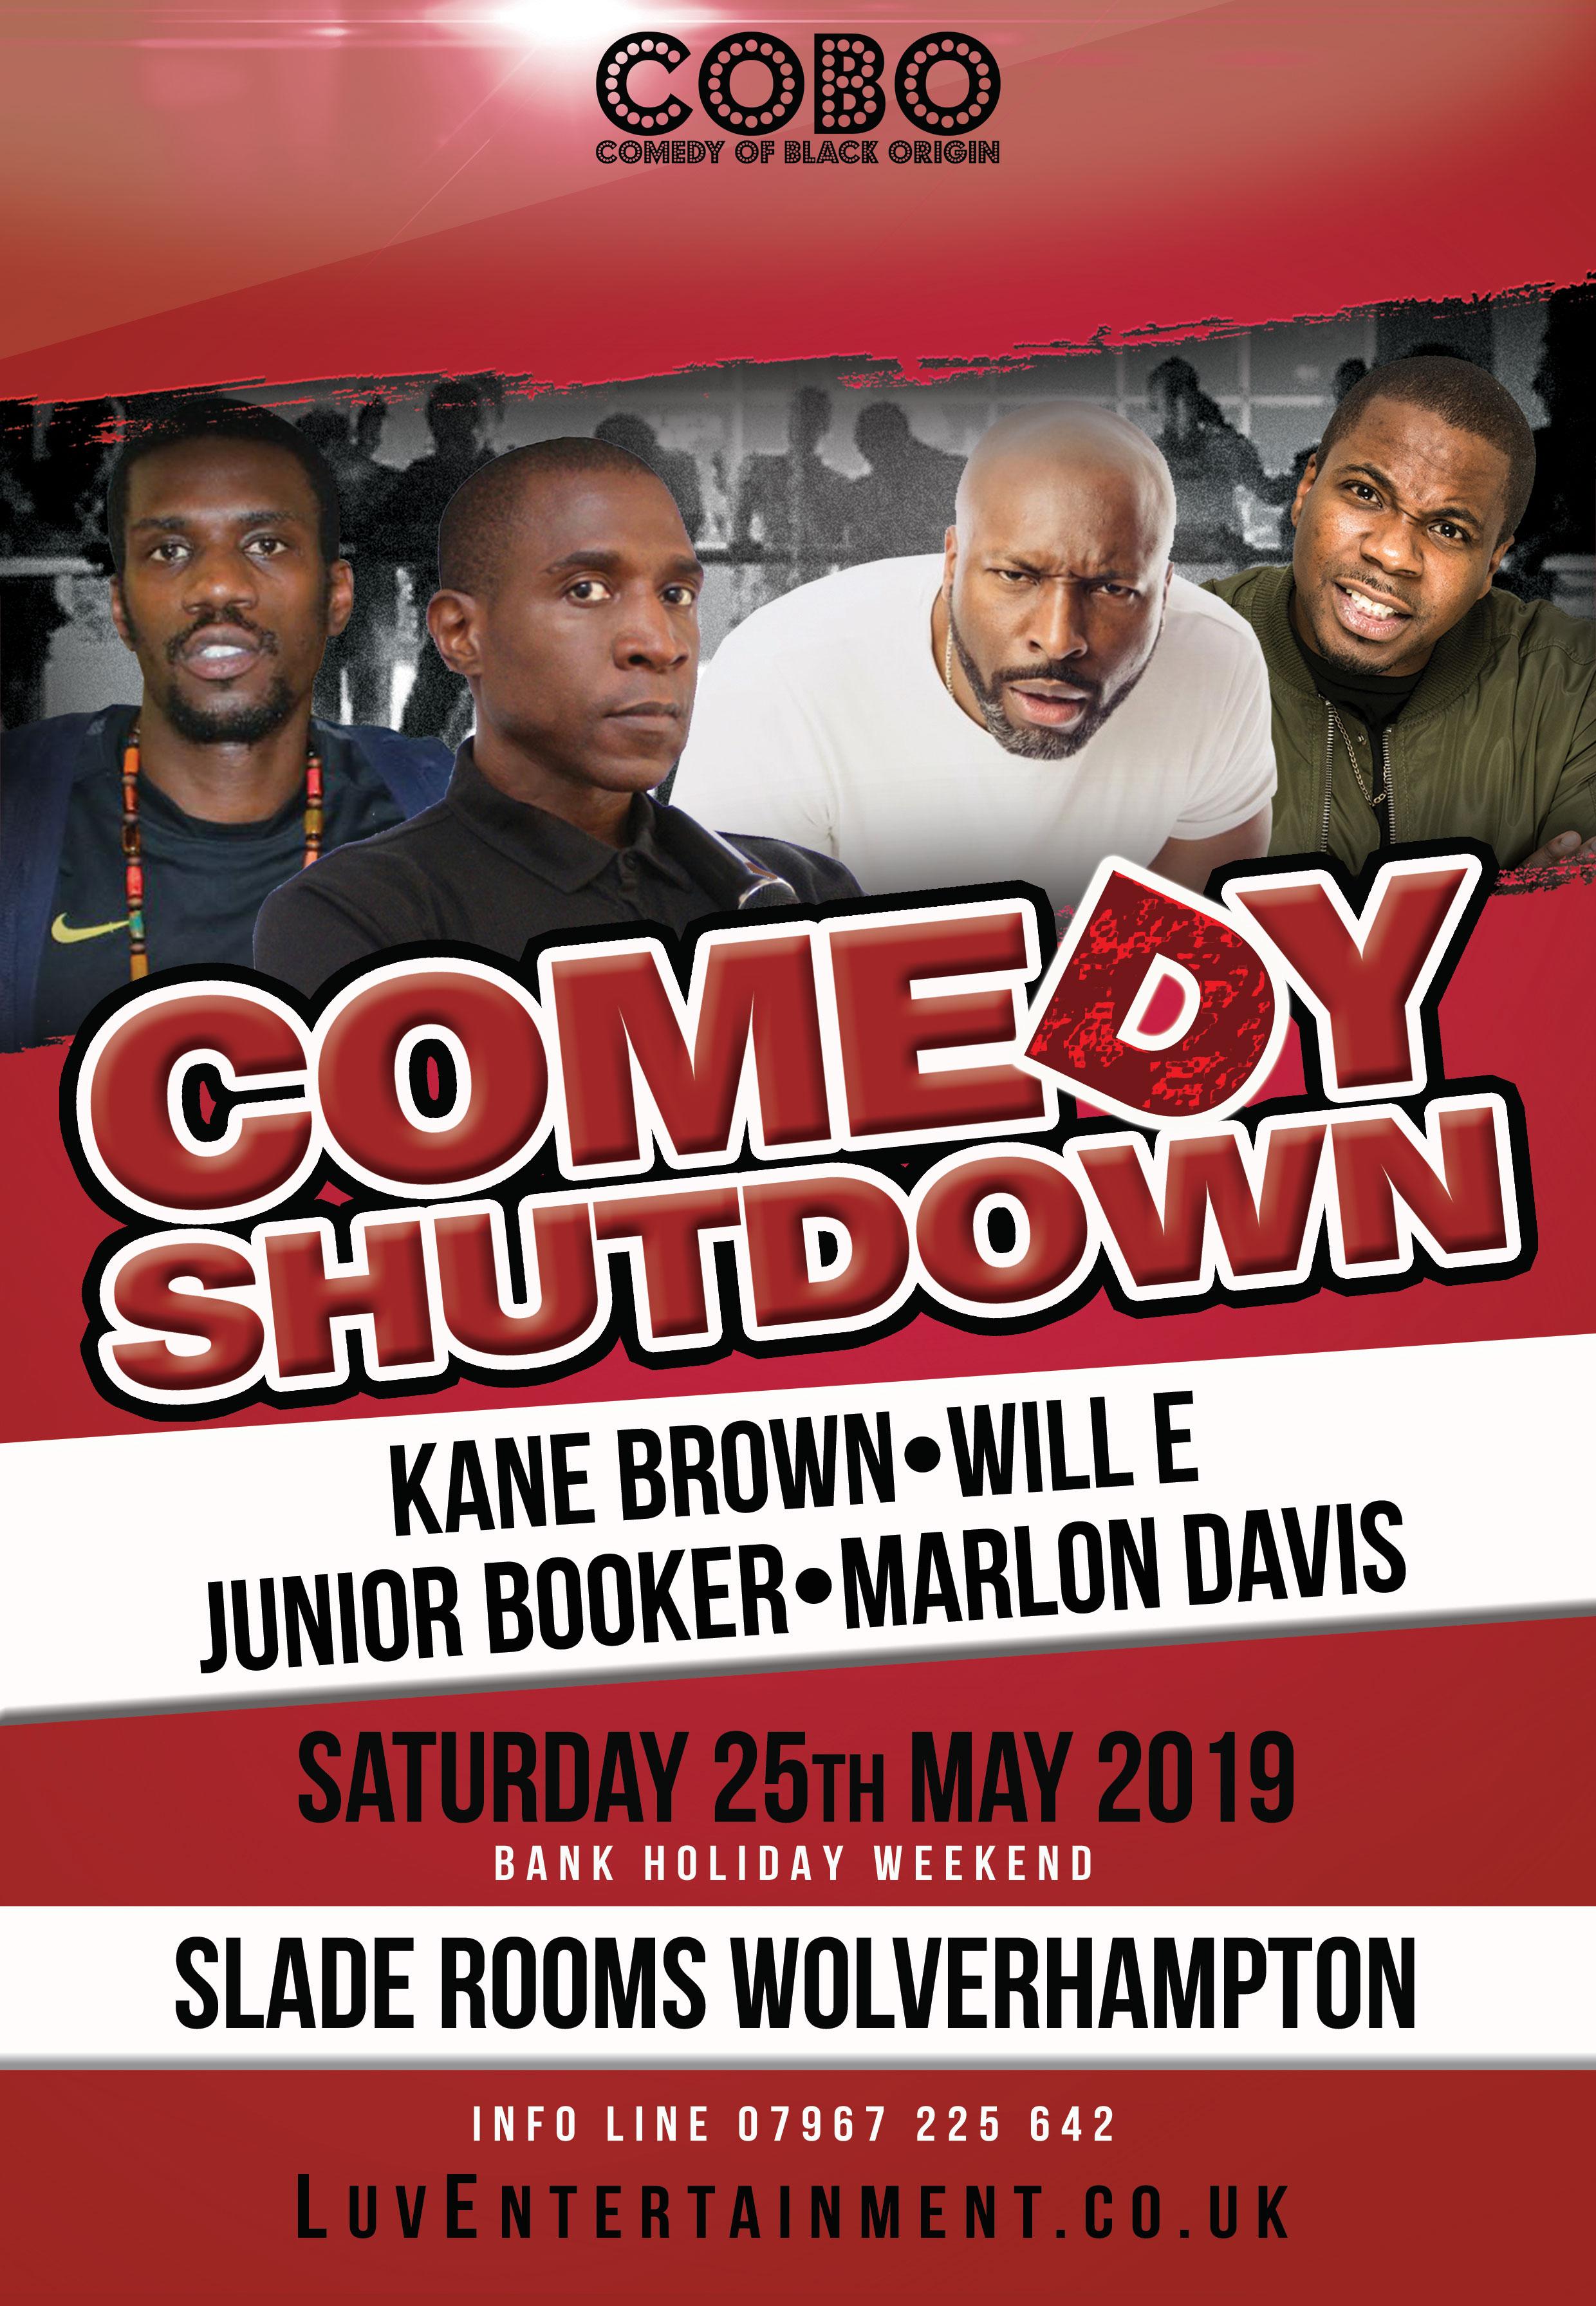 Comedy Shutdown Tour - Wolverhampton